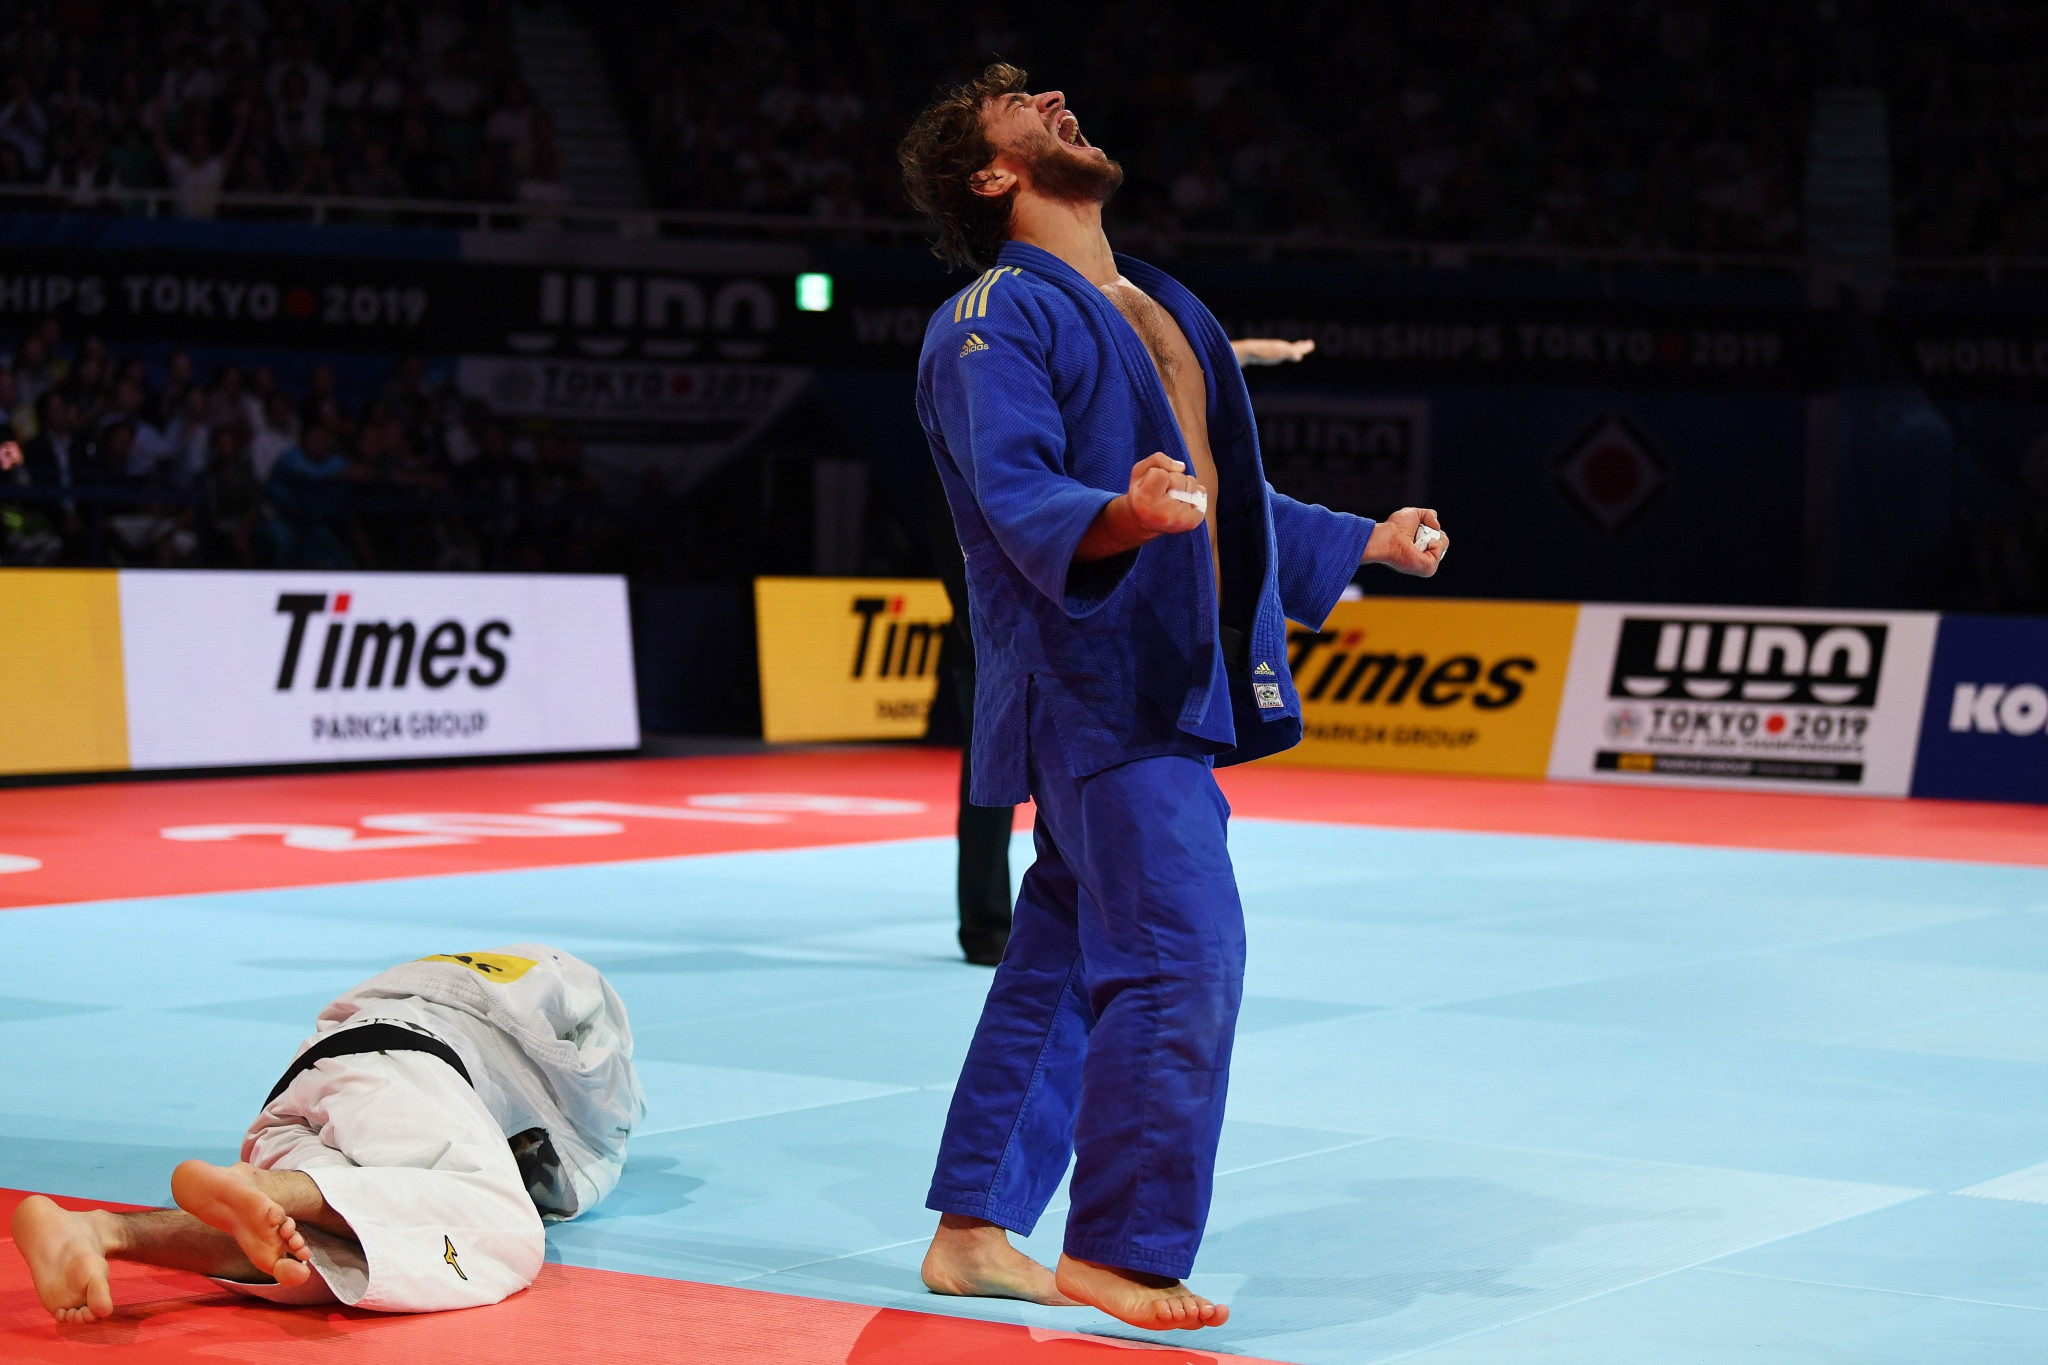 Heydarov upsets top seed Sterpu to clinch Zagreb Grand Prix title